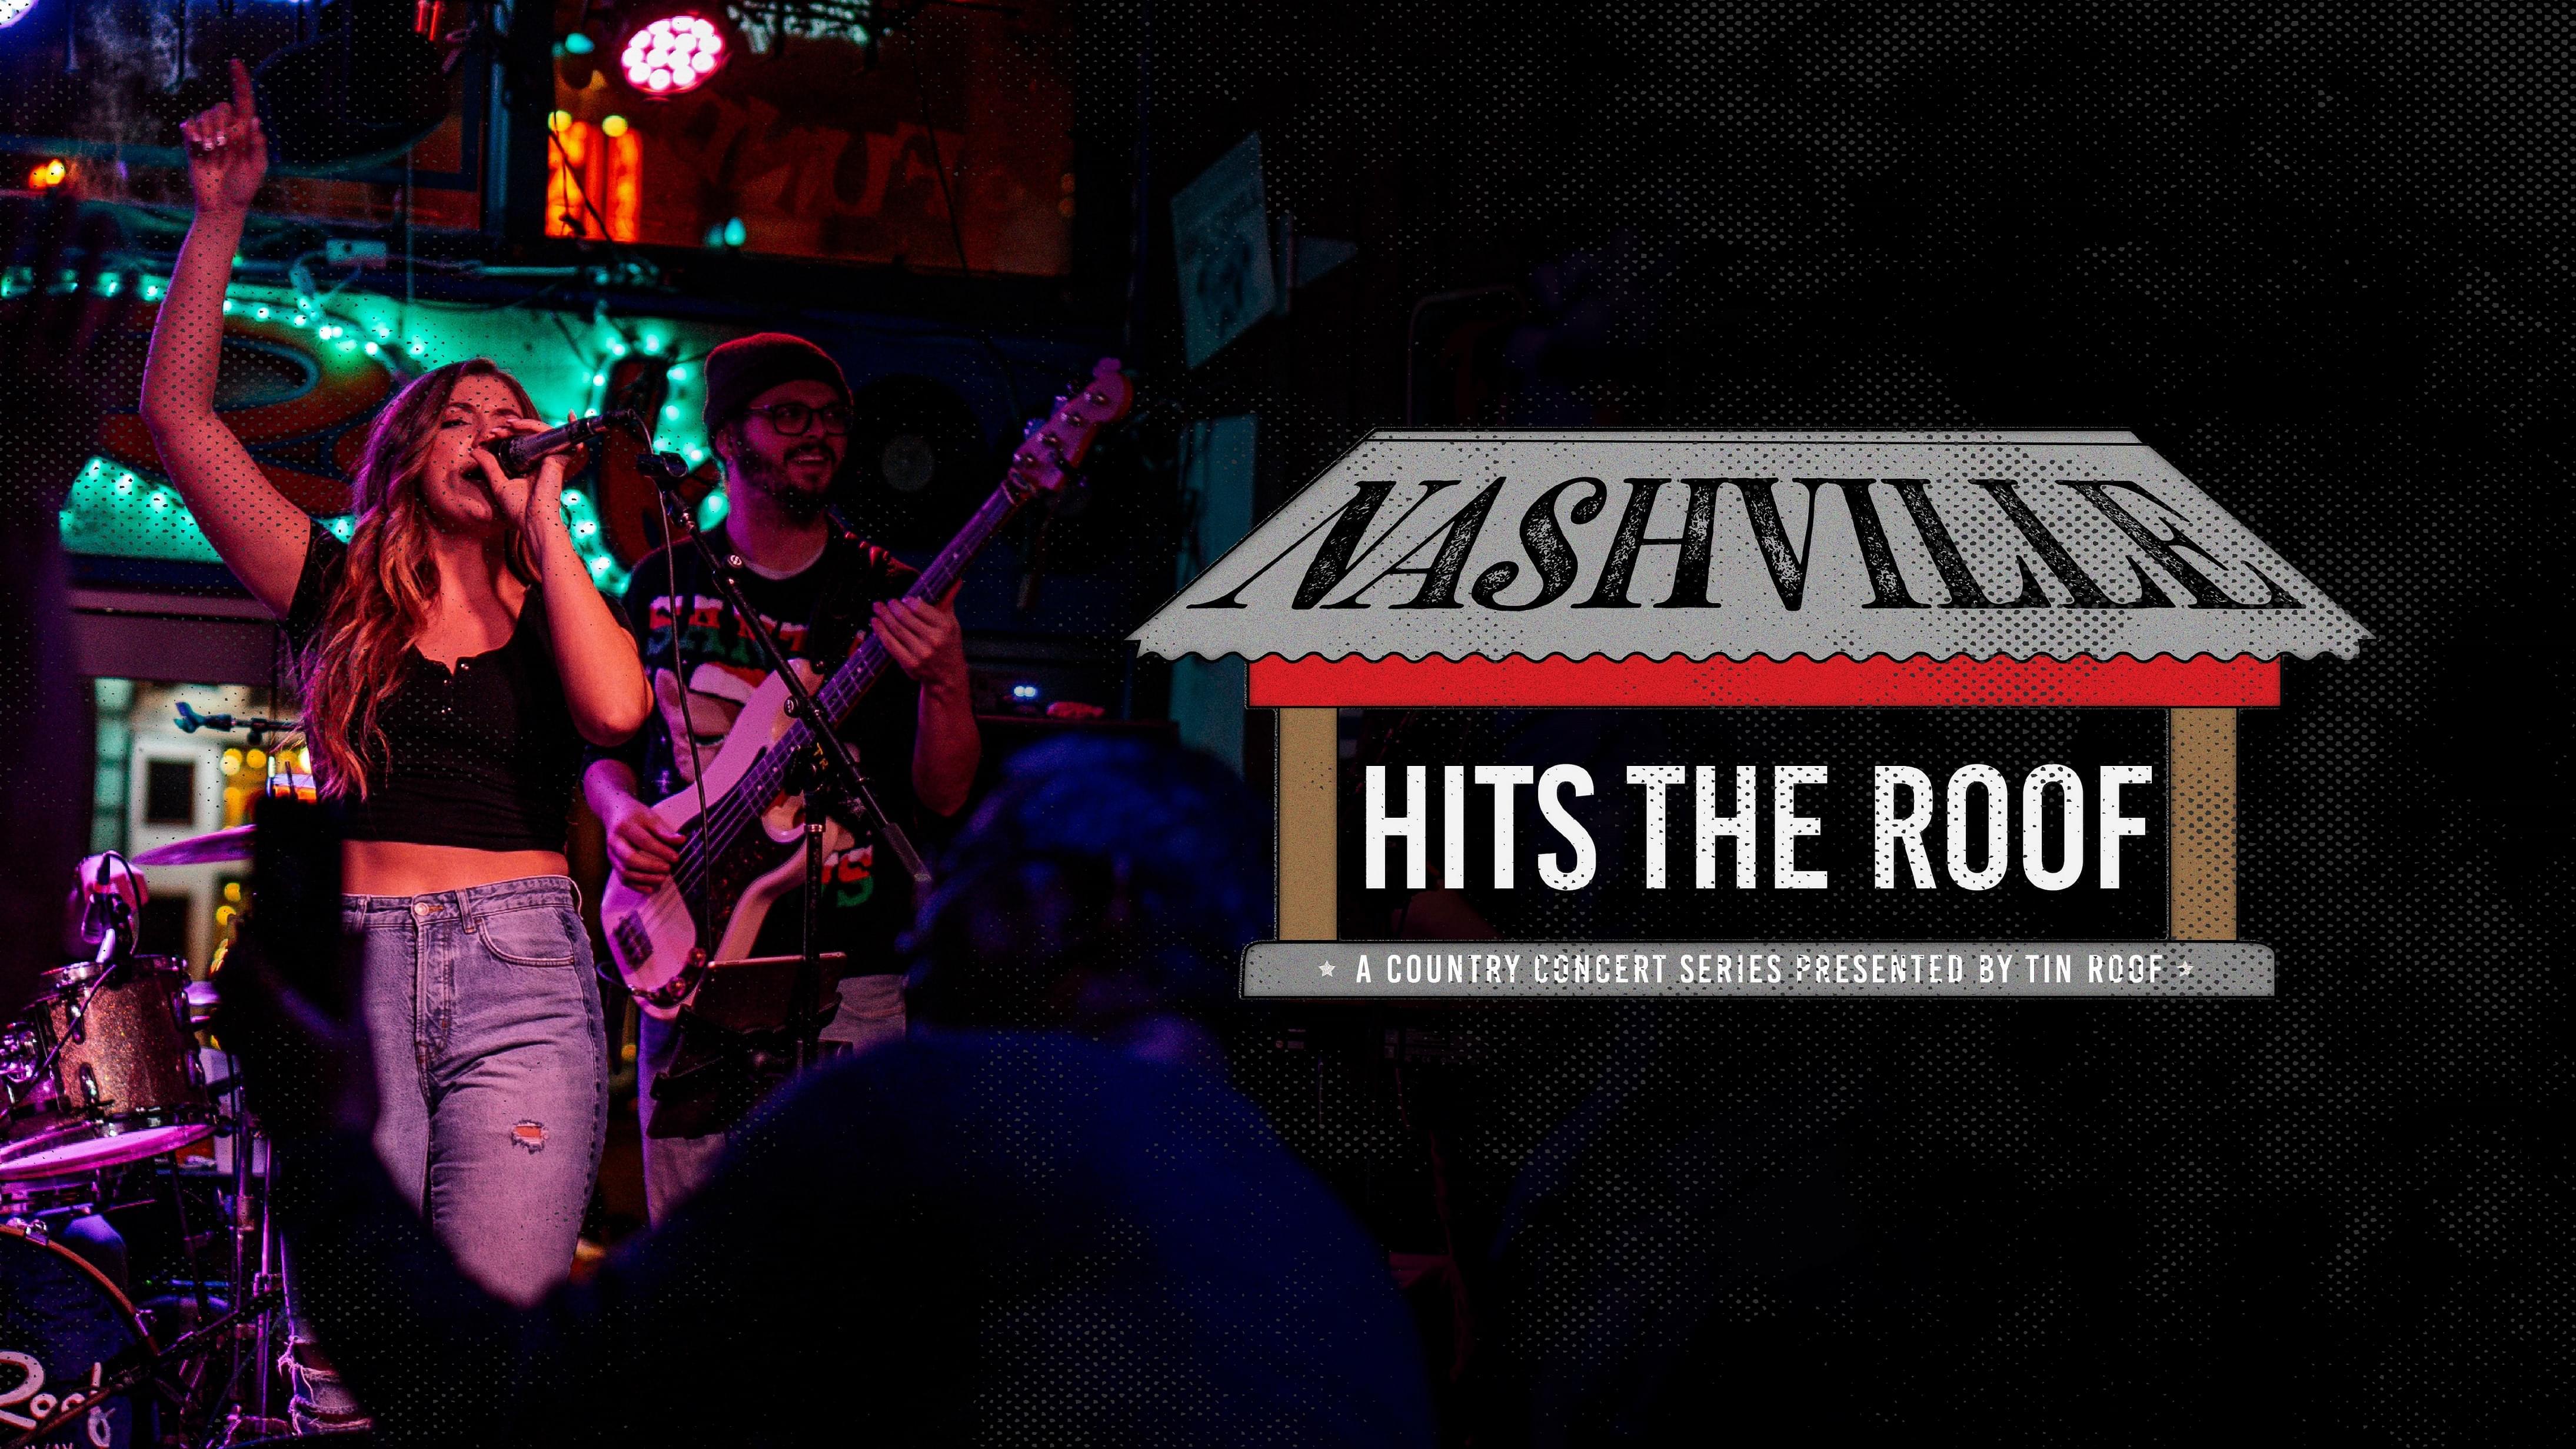 July 18 – Renee Blair (Nashville Hits The Roof Series)